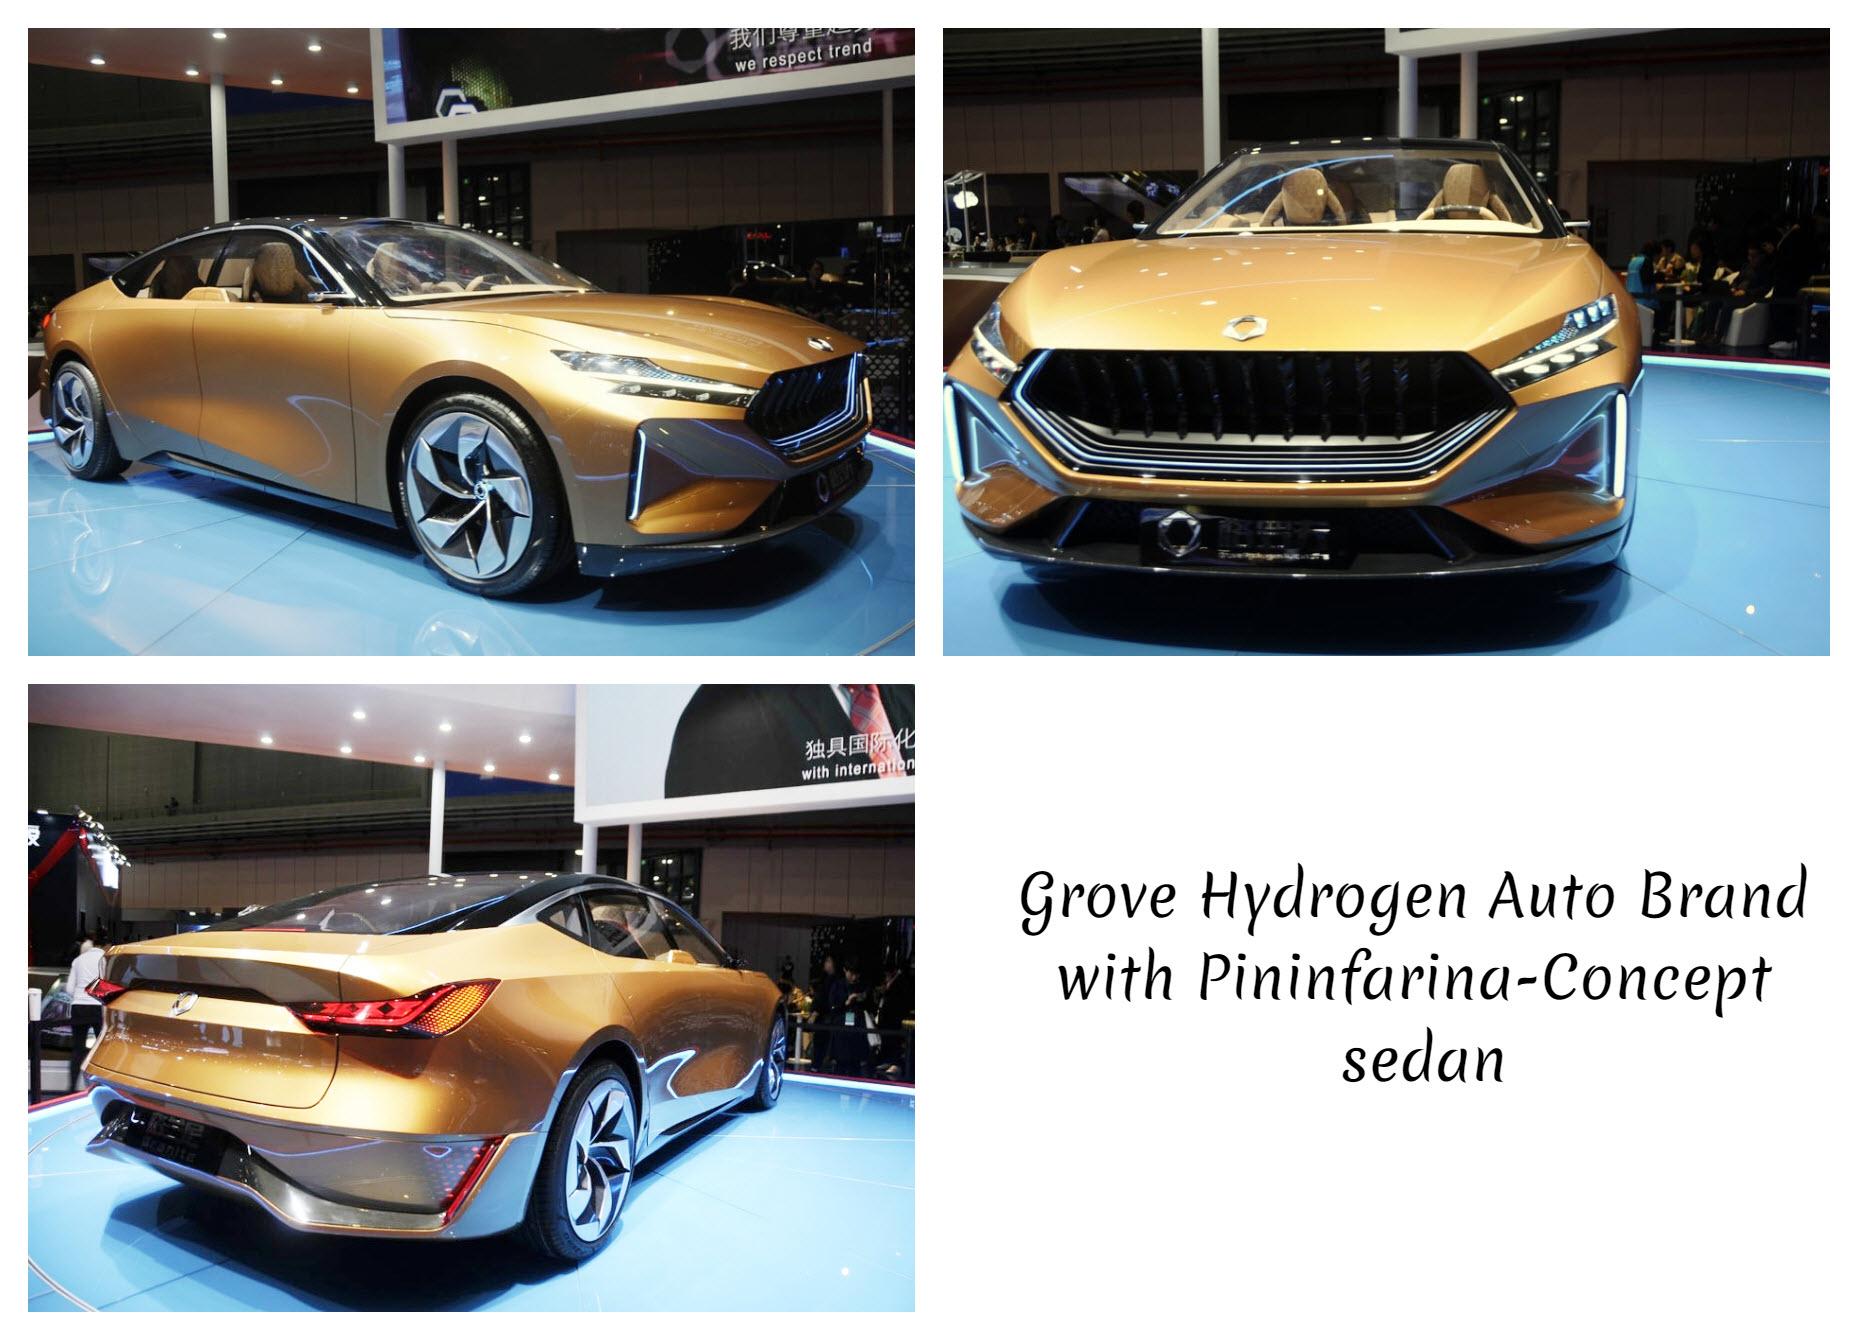 Grove Hydrogen Auto Brand with Pininfarina Concept sedan